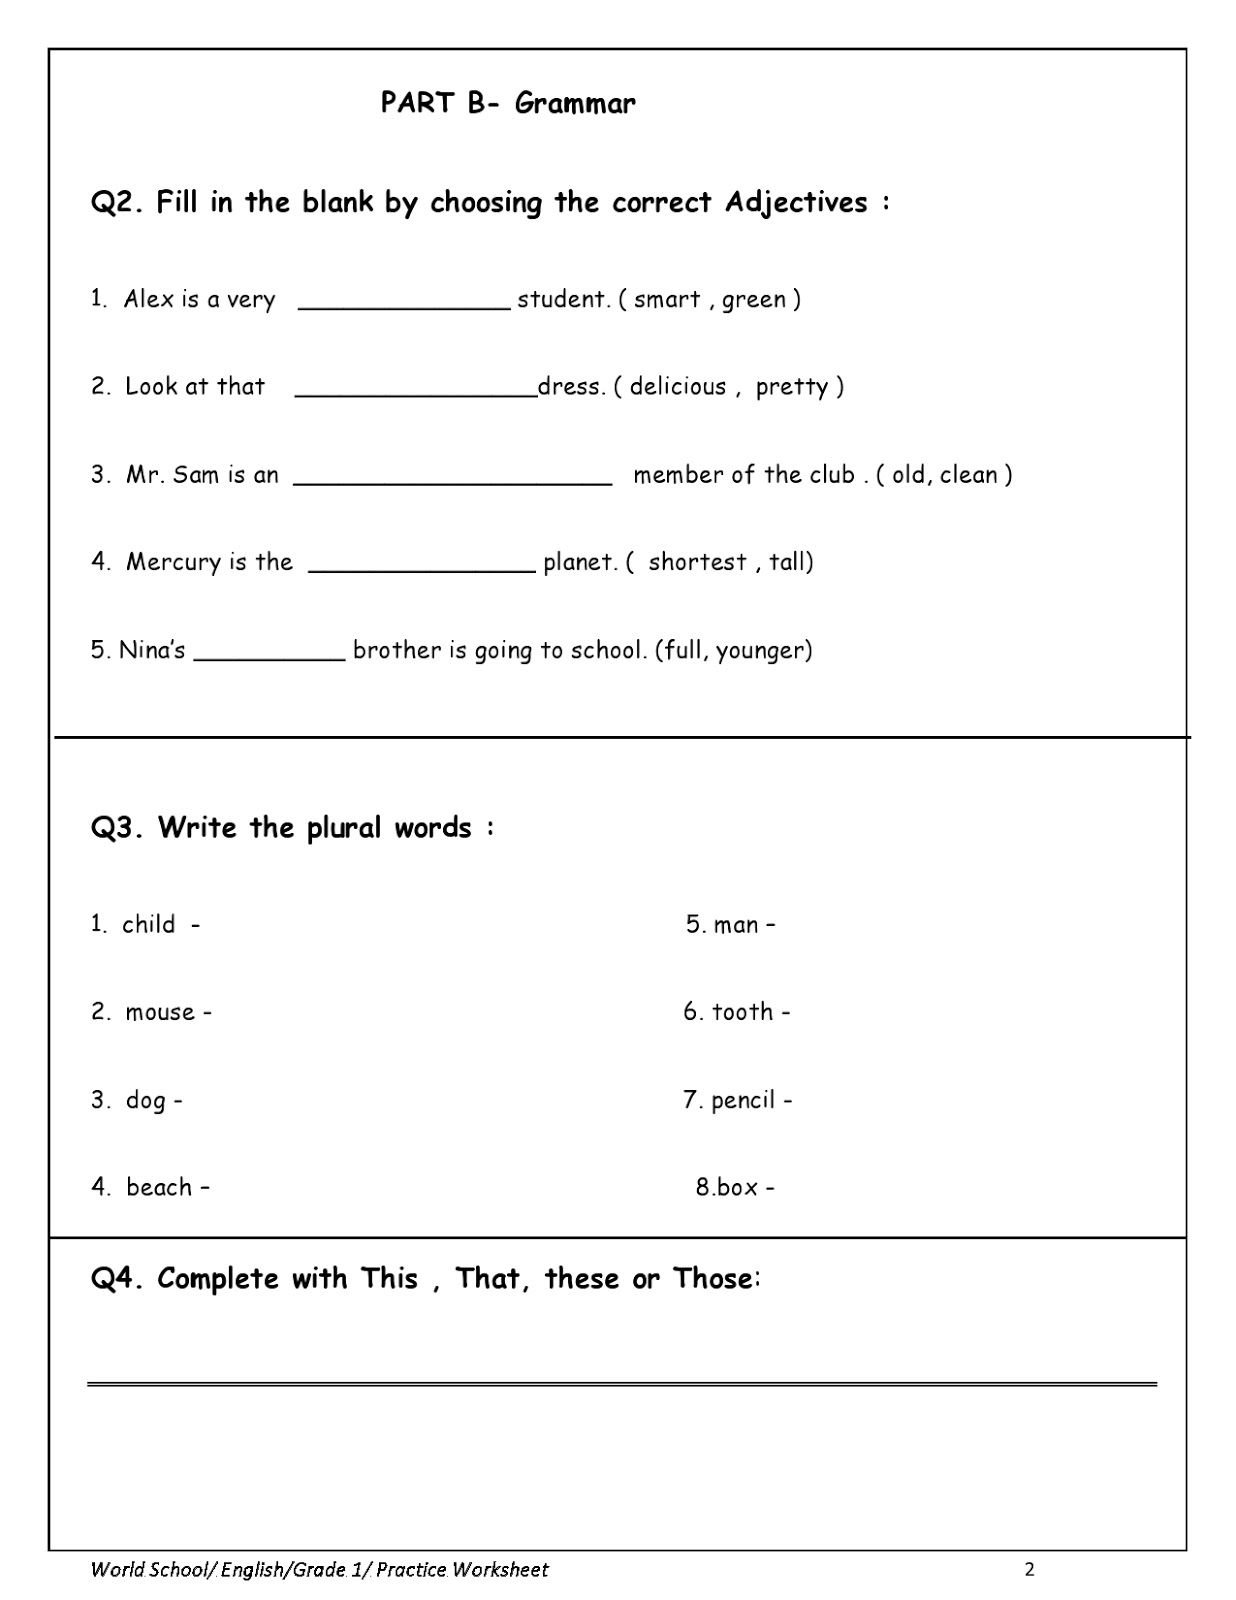 Homework for Grade 1 as on 07/04/2020   WORLD SCHOOL OMAN [ 1600 x 1236 Pixel ]